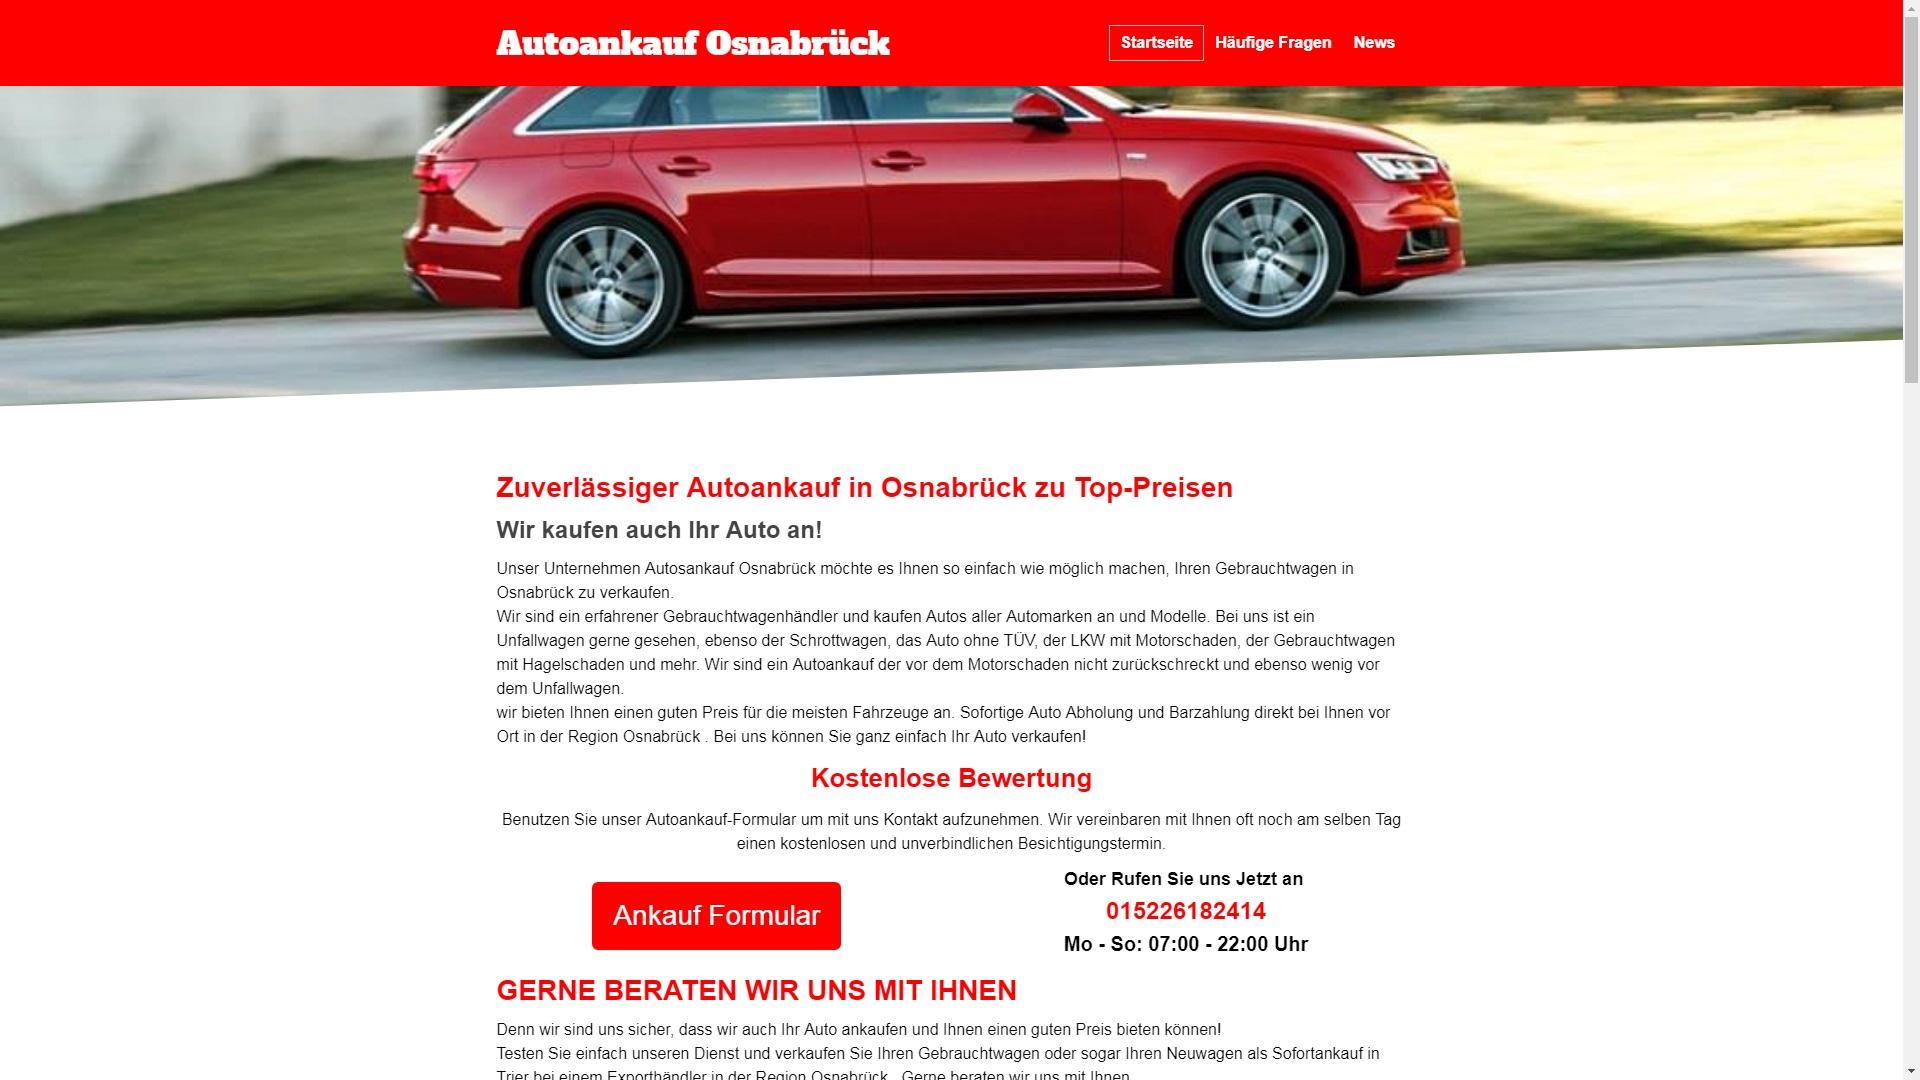 Autoankauf Osnabrück